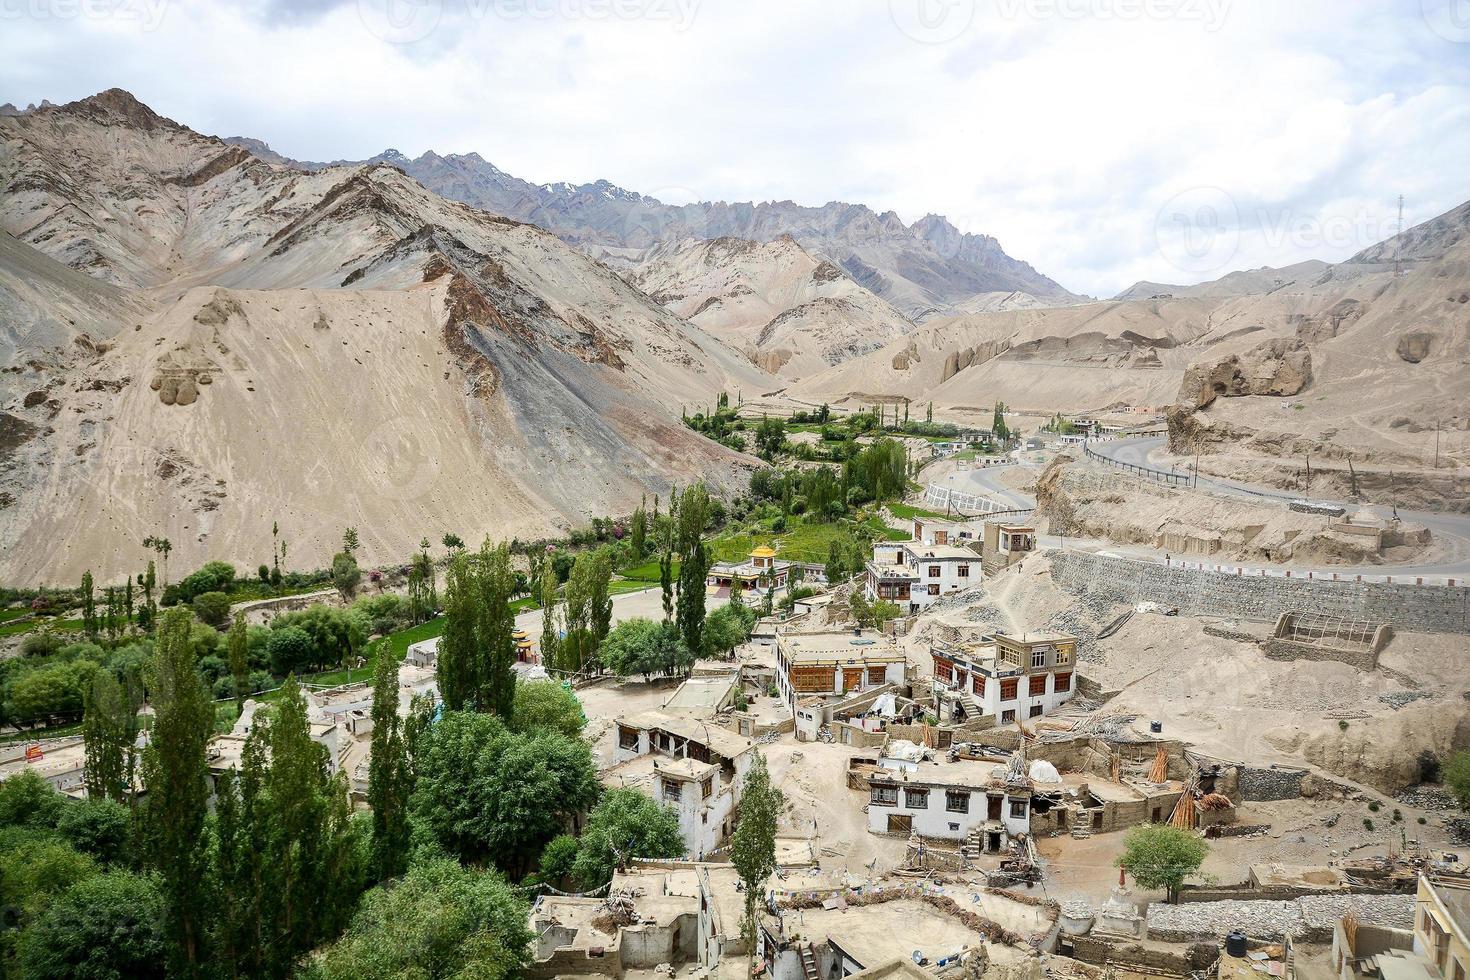 dorp in de buurt van lamayuru klooster, ladakh, india foto